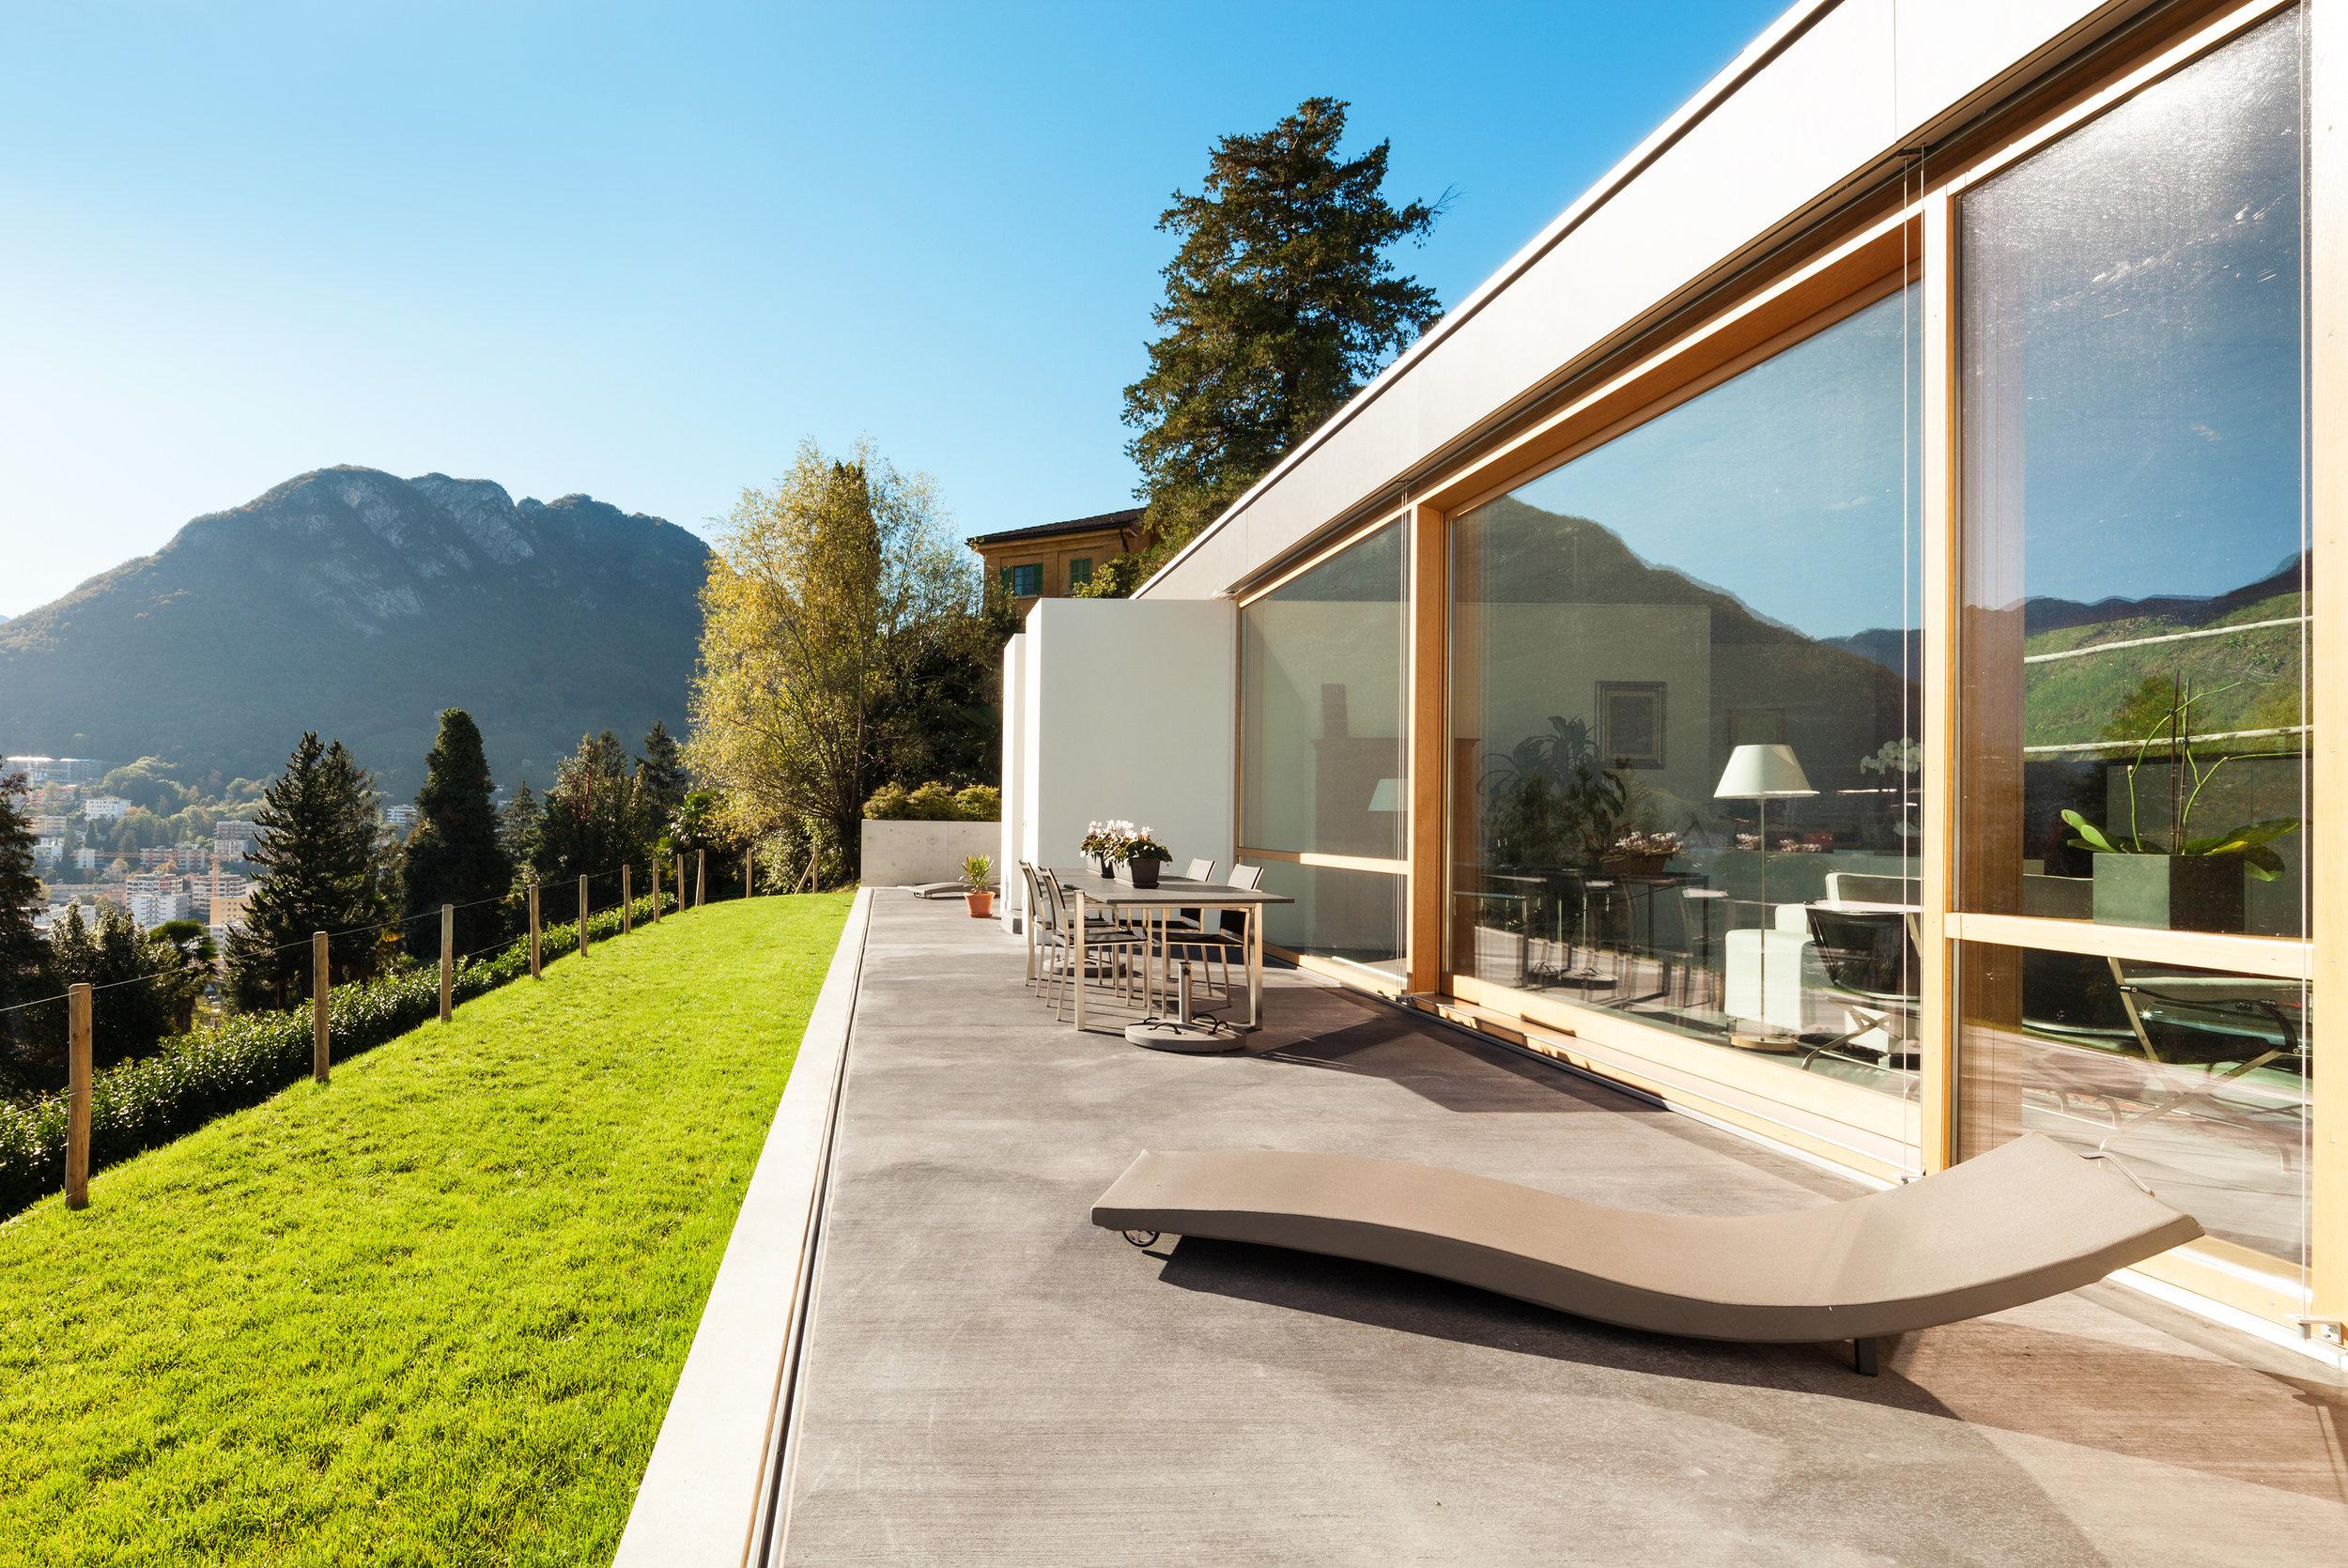 bigstock-Beautifull-modern-house-in-cem-52905640.jpg